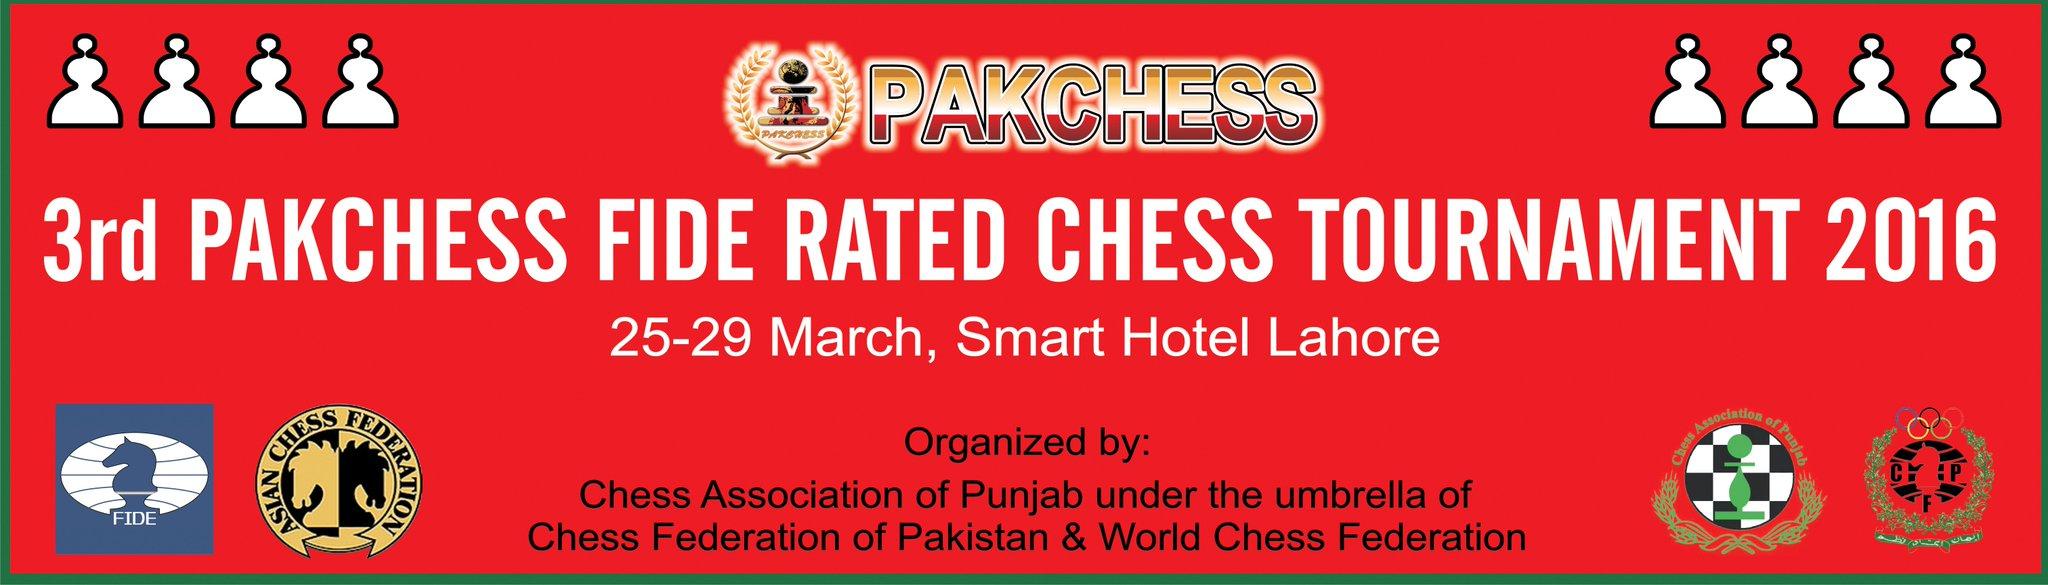 3rd PAKCHESS Fide rated Chess Tournament 2016